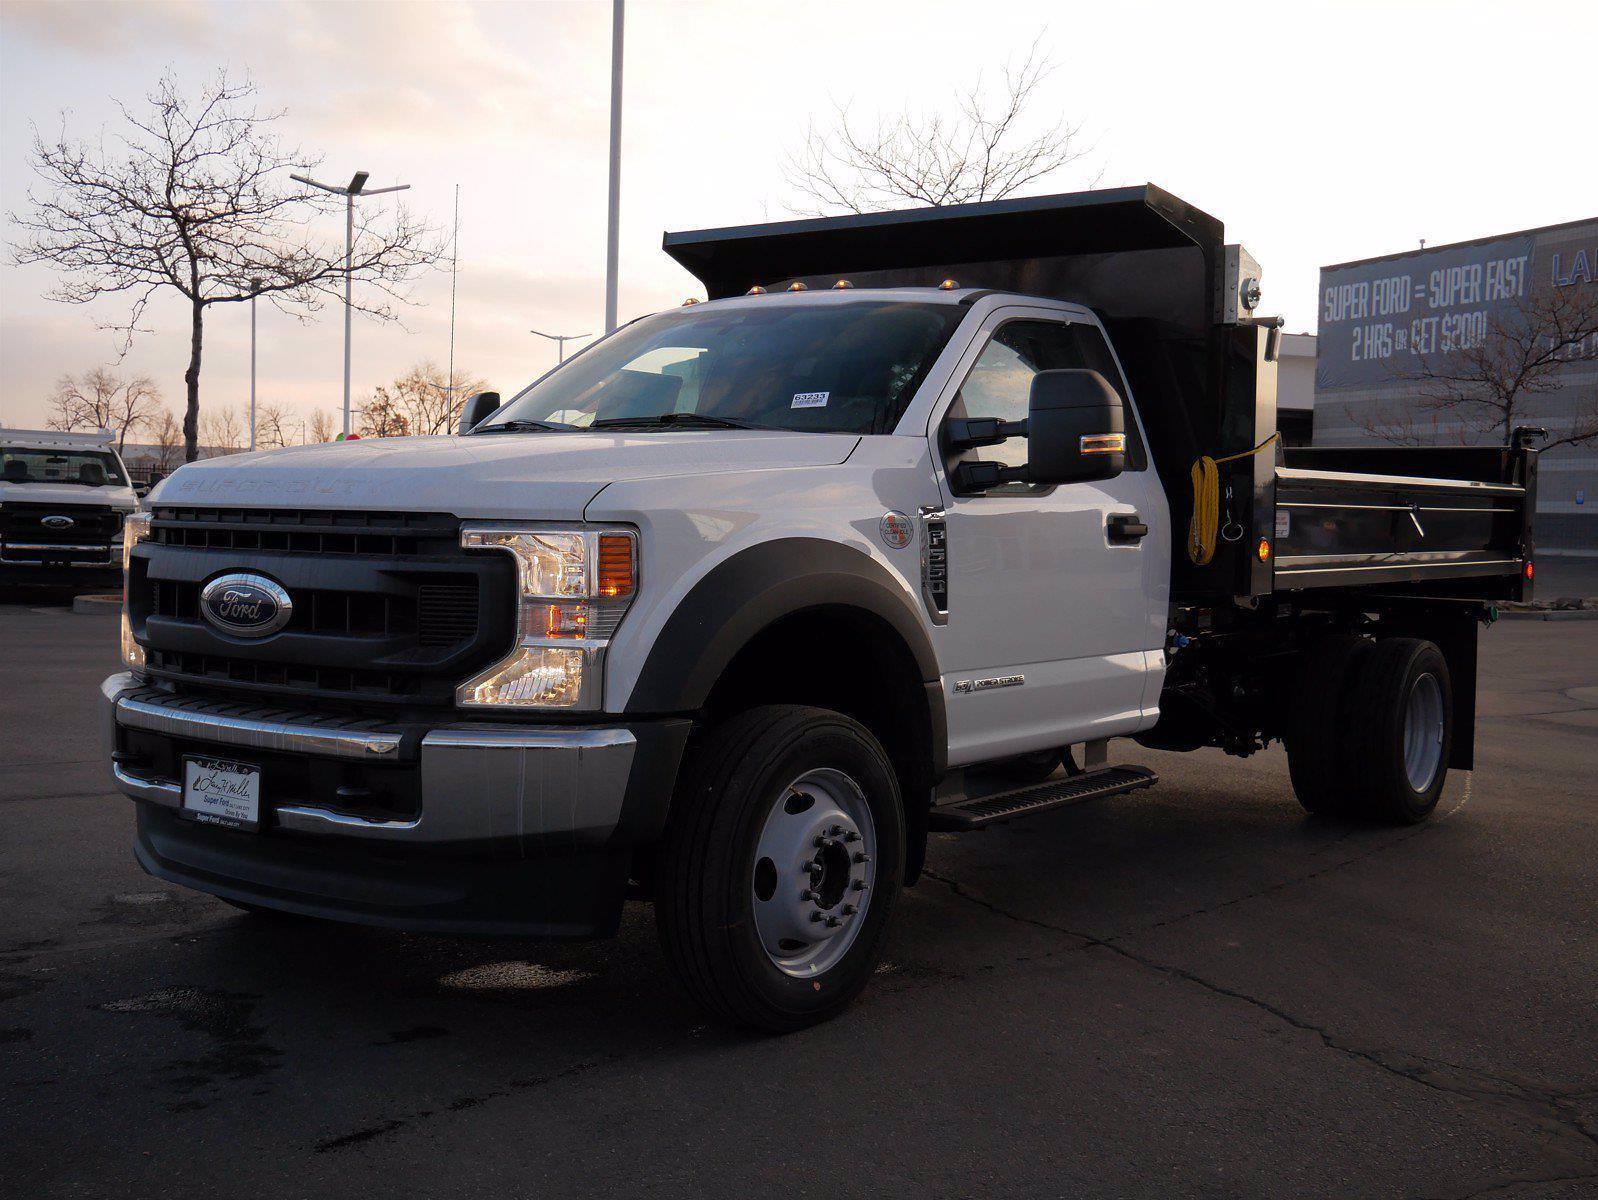 2021 Ford F-550 Regular Cab DRW 4x4, Scelzi Dump Body #64096 - photo 1